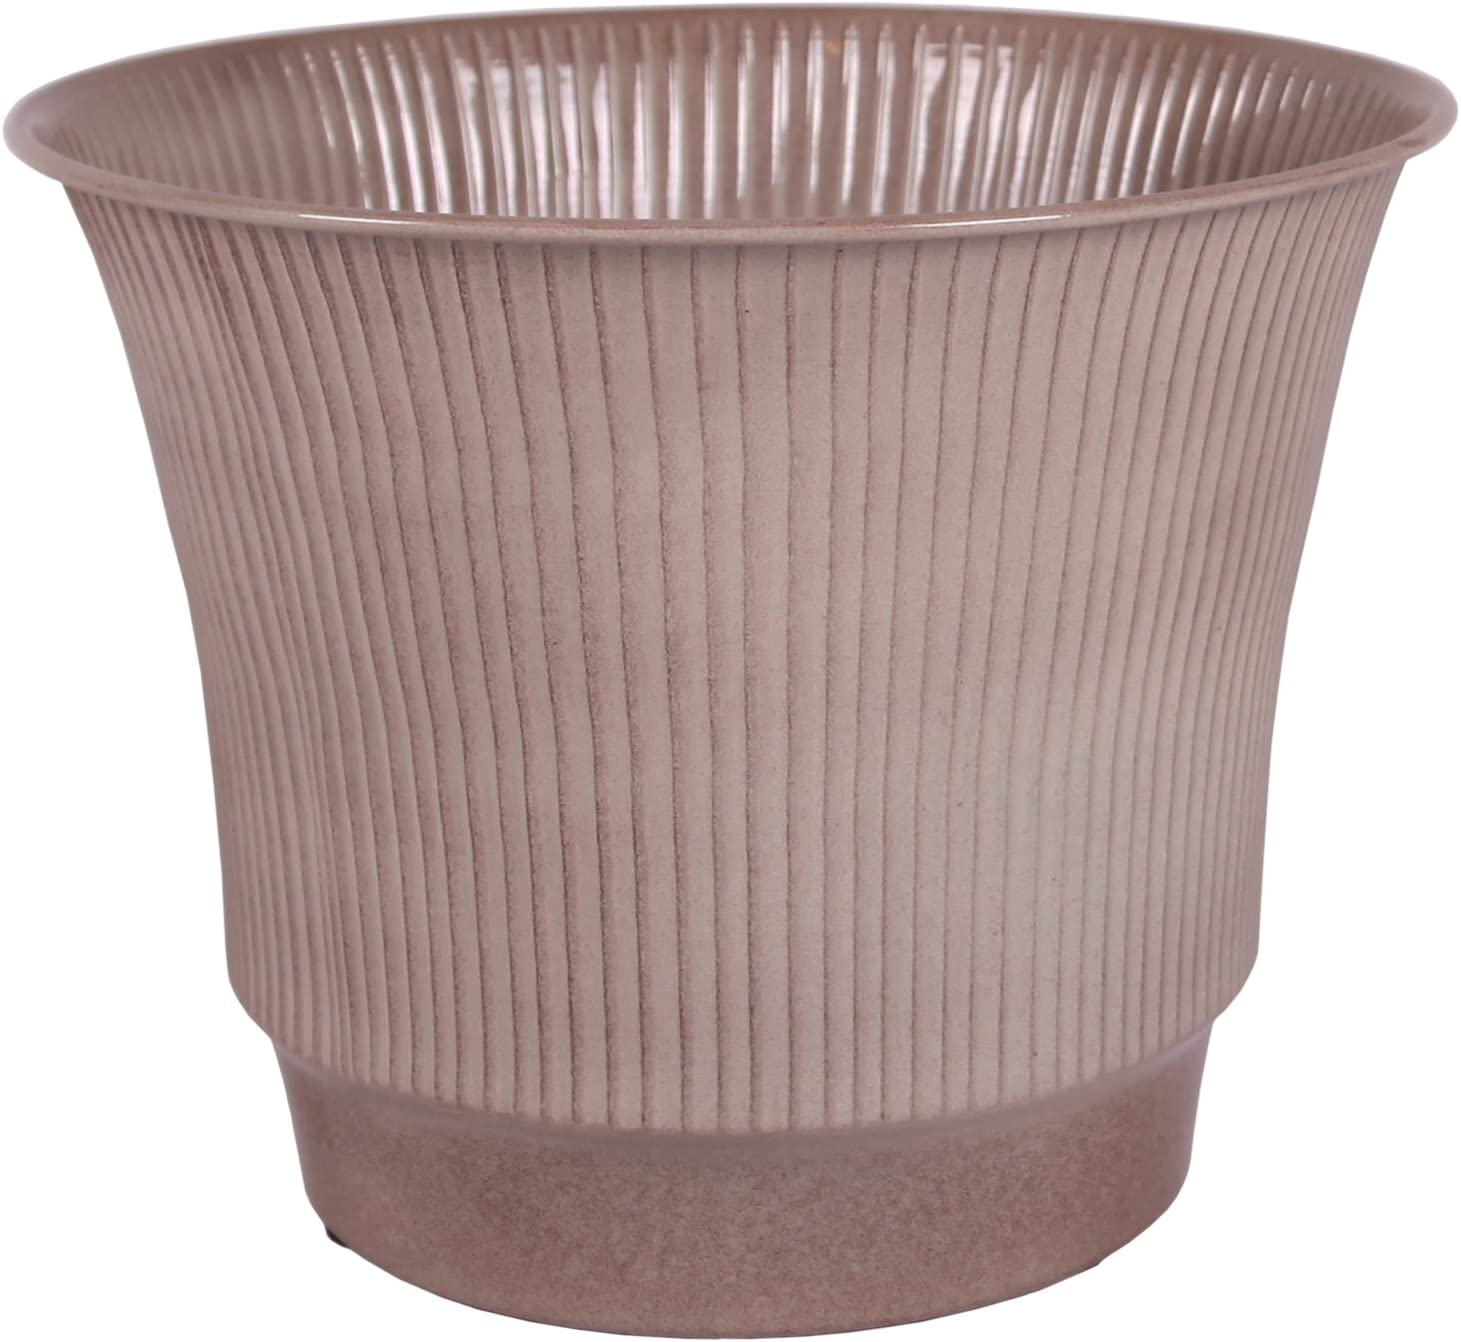 Robert Allen Home & Garden MPT01848 Madison Plastic, 14 Inch, Latte